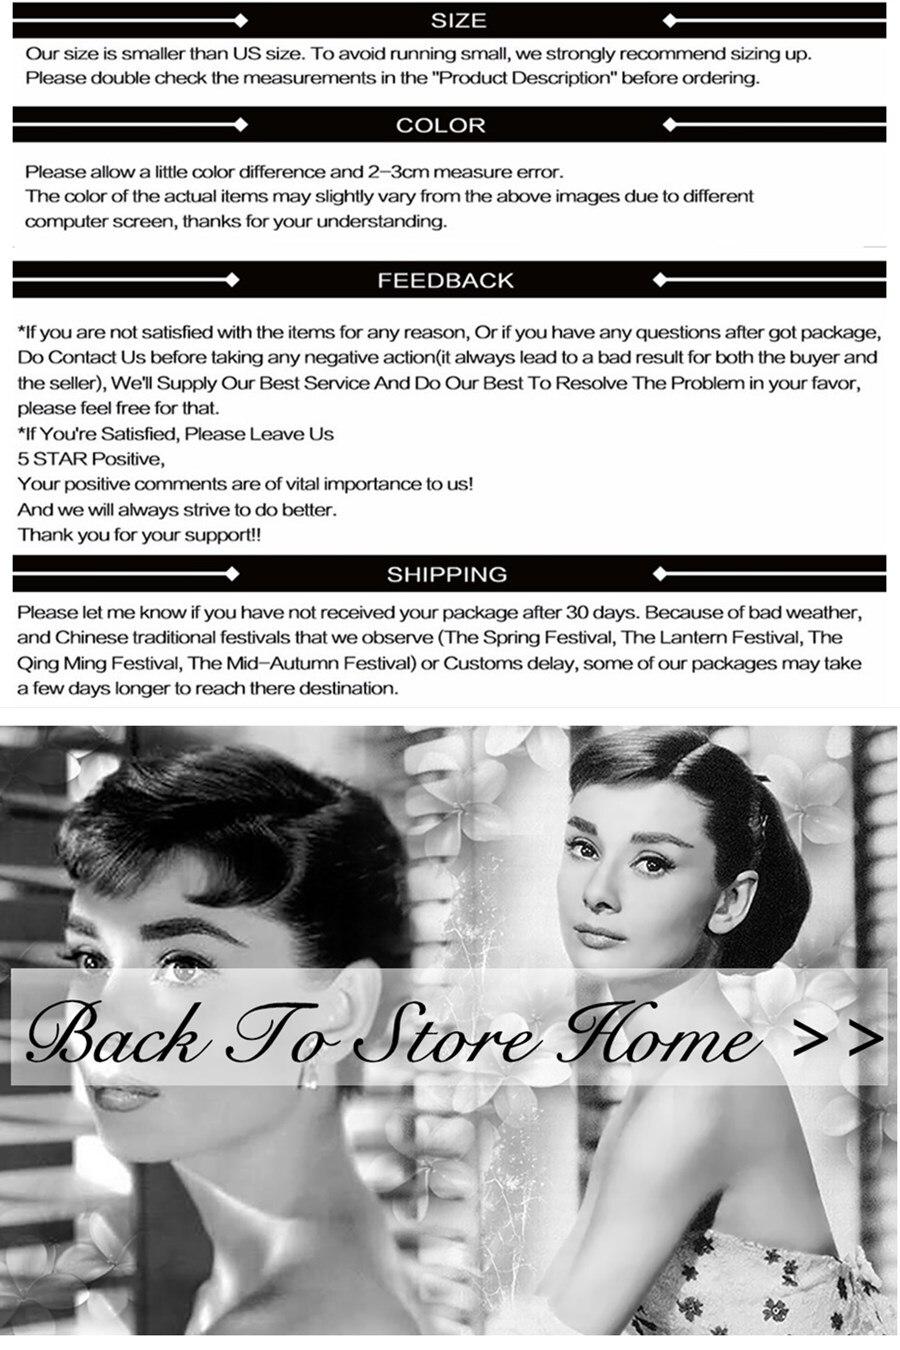 HTB1QBKHlbsTMeJjy1zbq6AhlVXaF Women Summer Dresses 2019 Robe Vintage 1950s 60s Pin Up Big Swing Party Work Wear Rockabilly Dress Black Polka Dot Vestidos